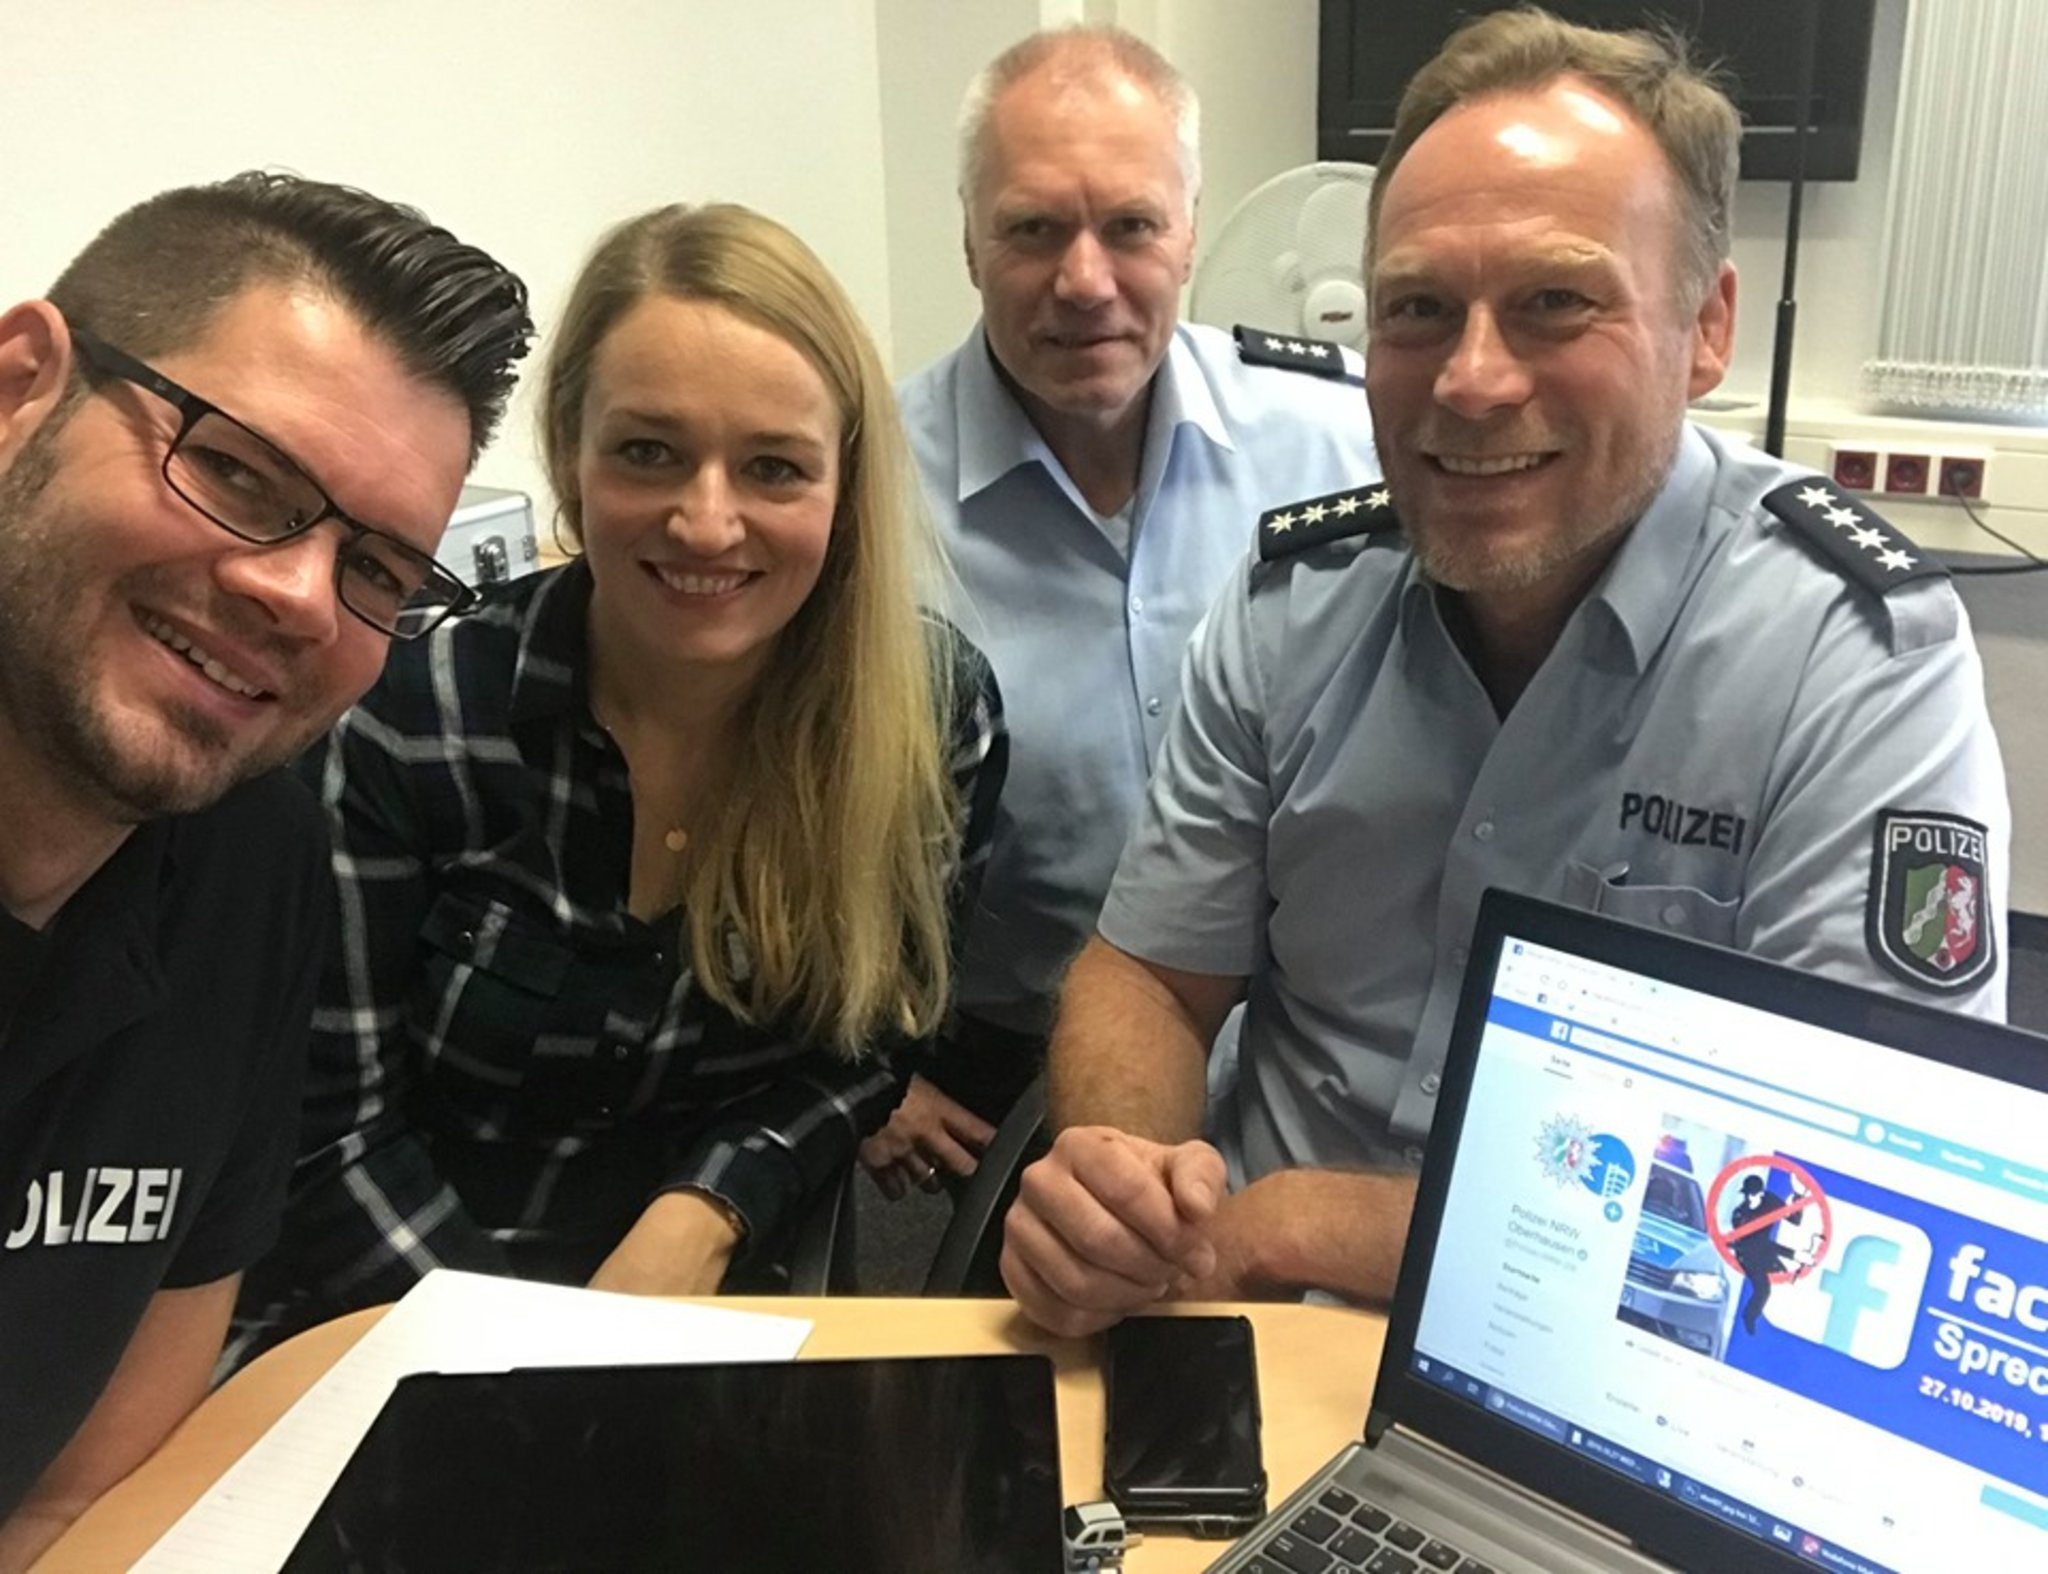 Facebook Polizei Oberhausen